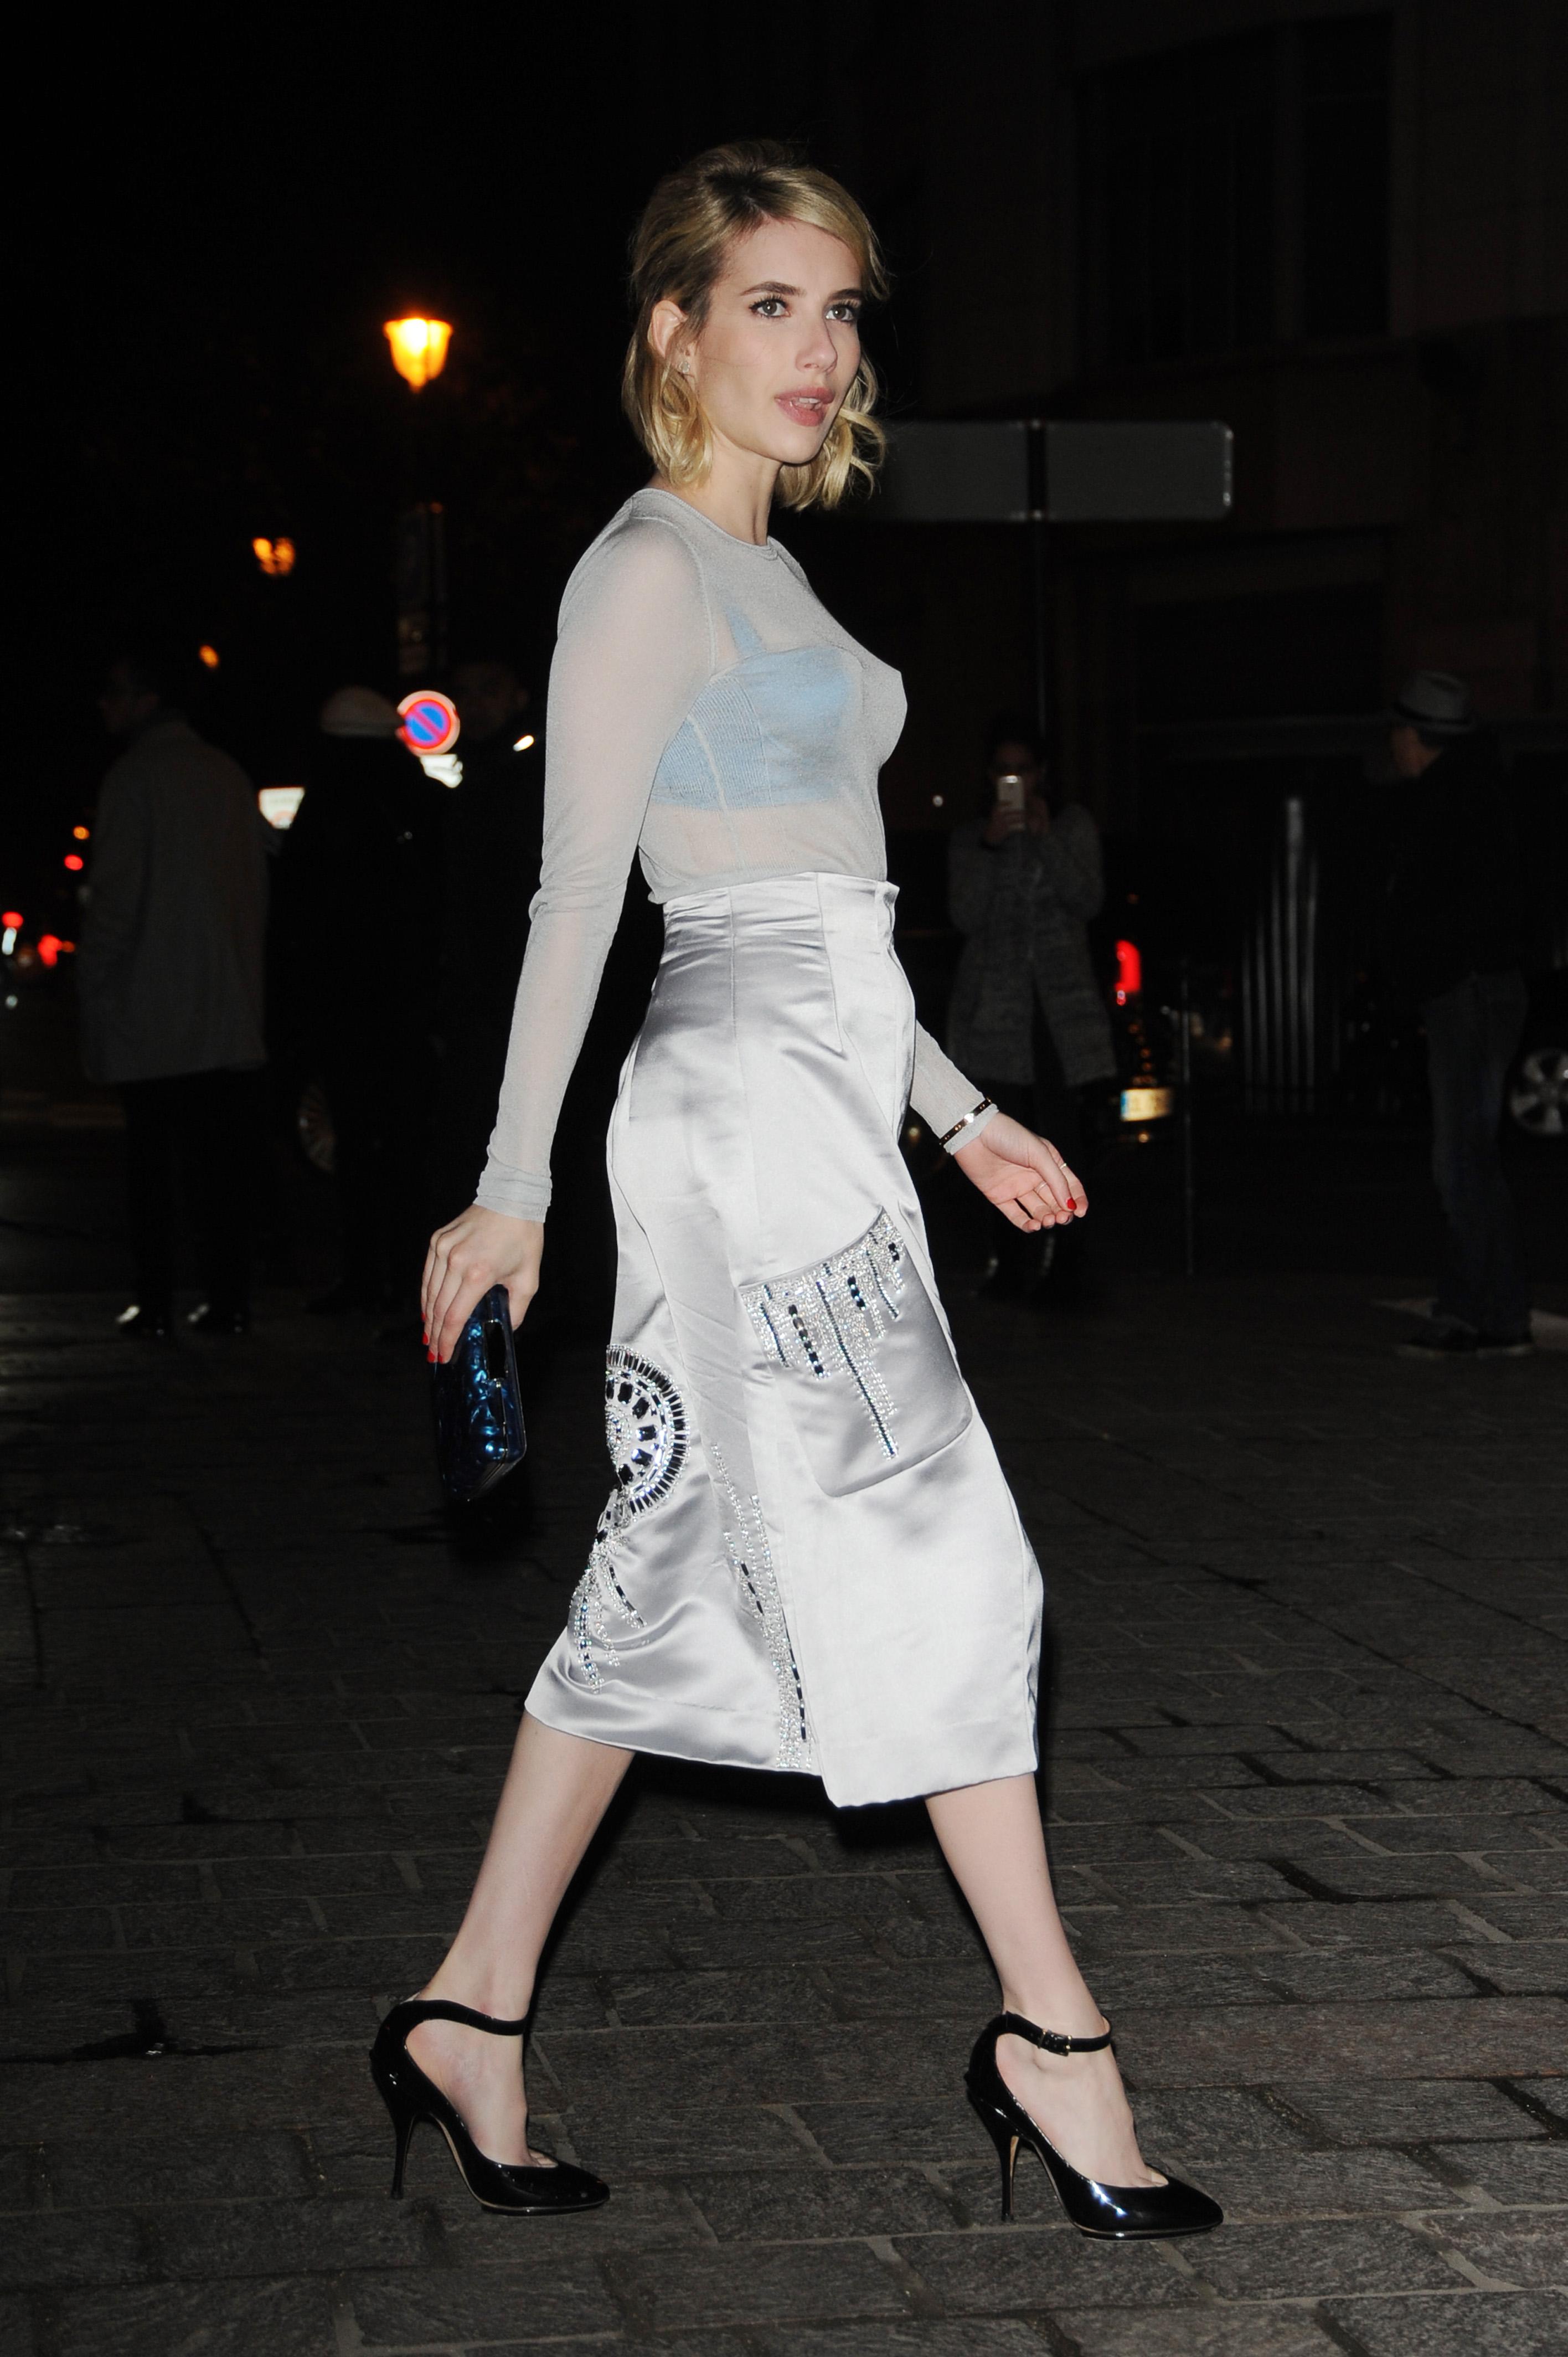 Emma-Roberts-HM-Fashion-Show-Paris-Fashion-Week-2016-11.jpg